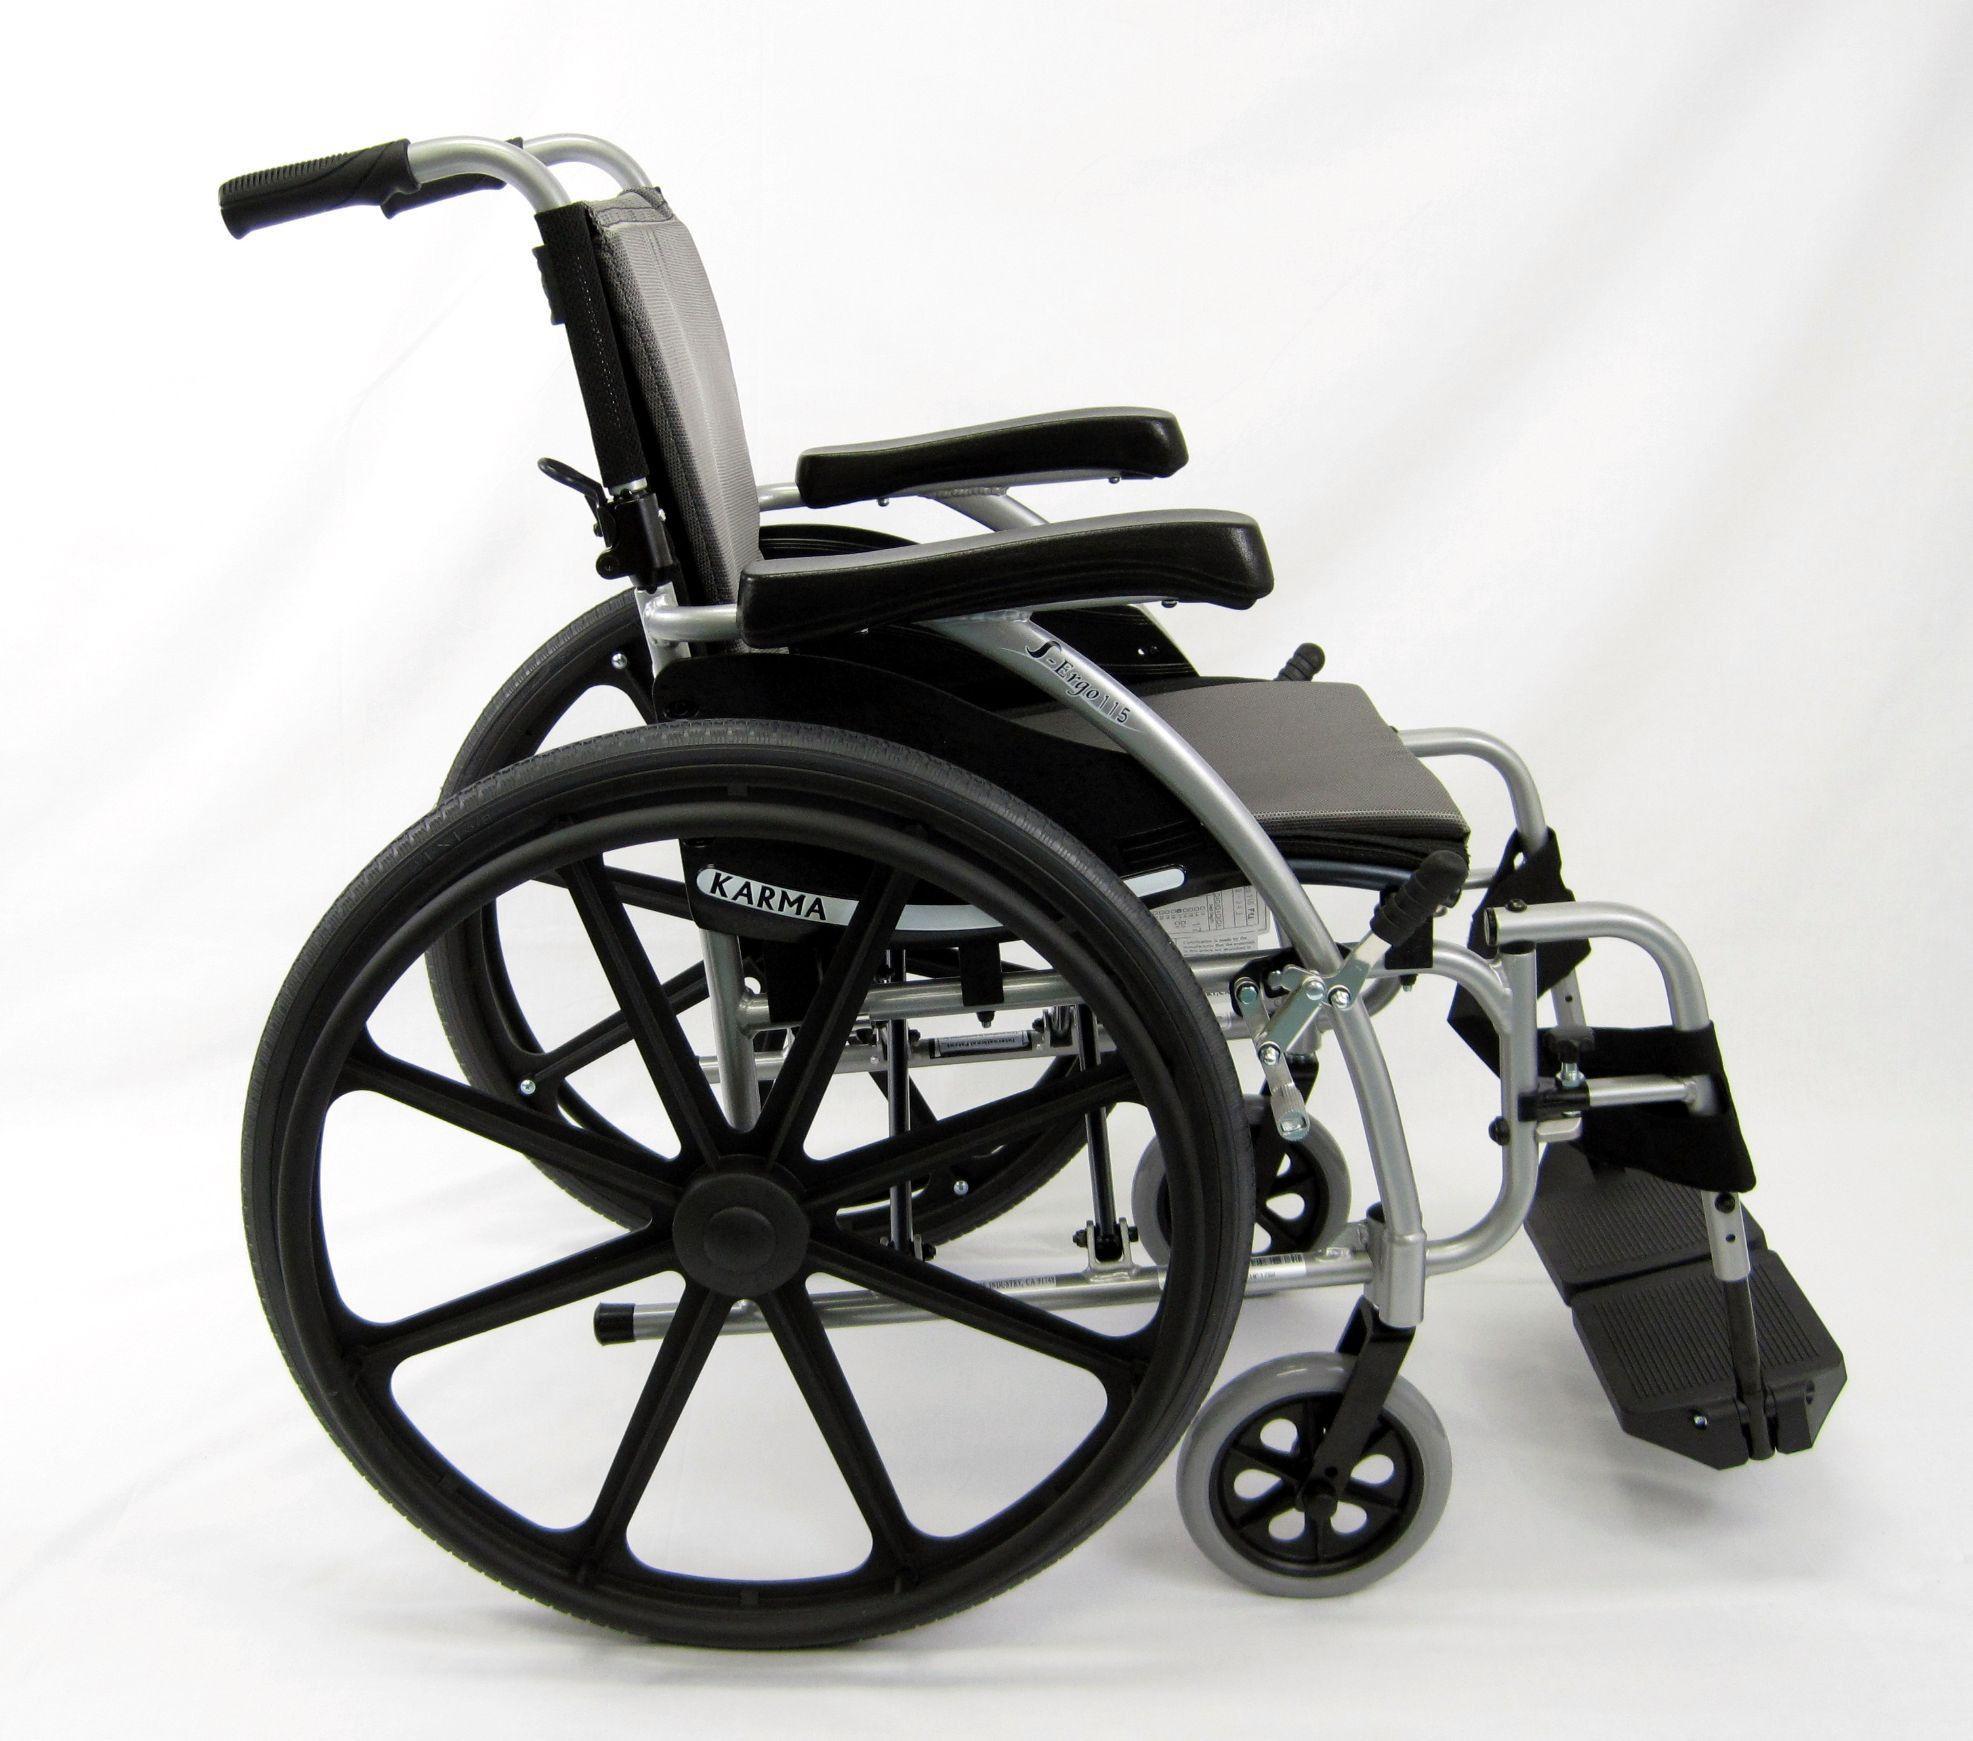 Ergonomic LtWt Wheelchair Silver SERGO115F18SMG